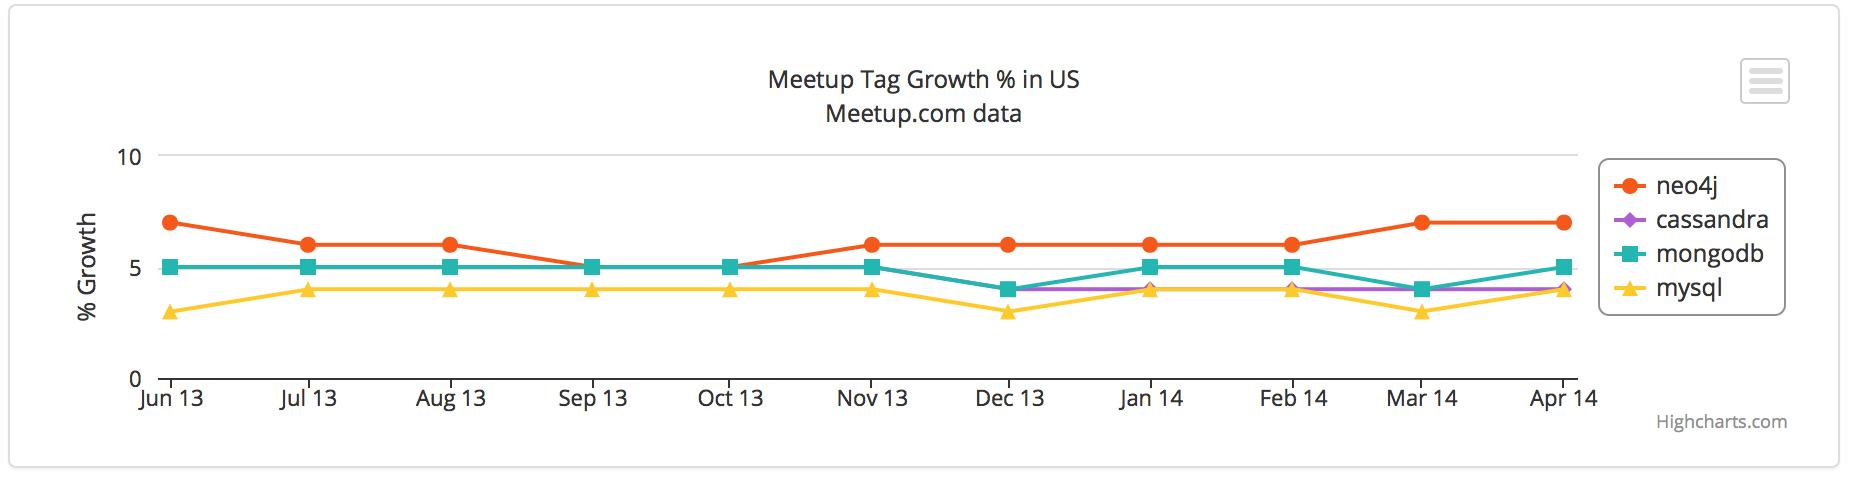 Meetup Tag Growth %